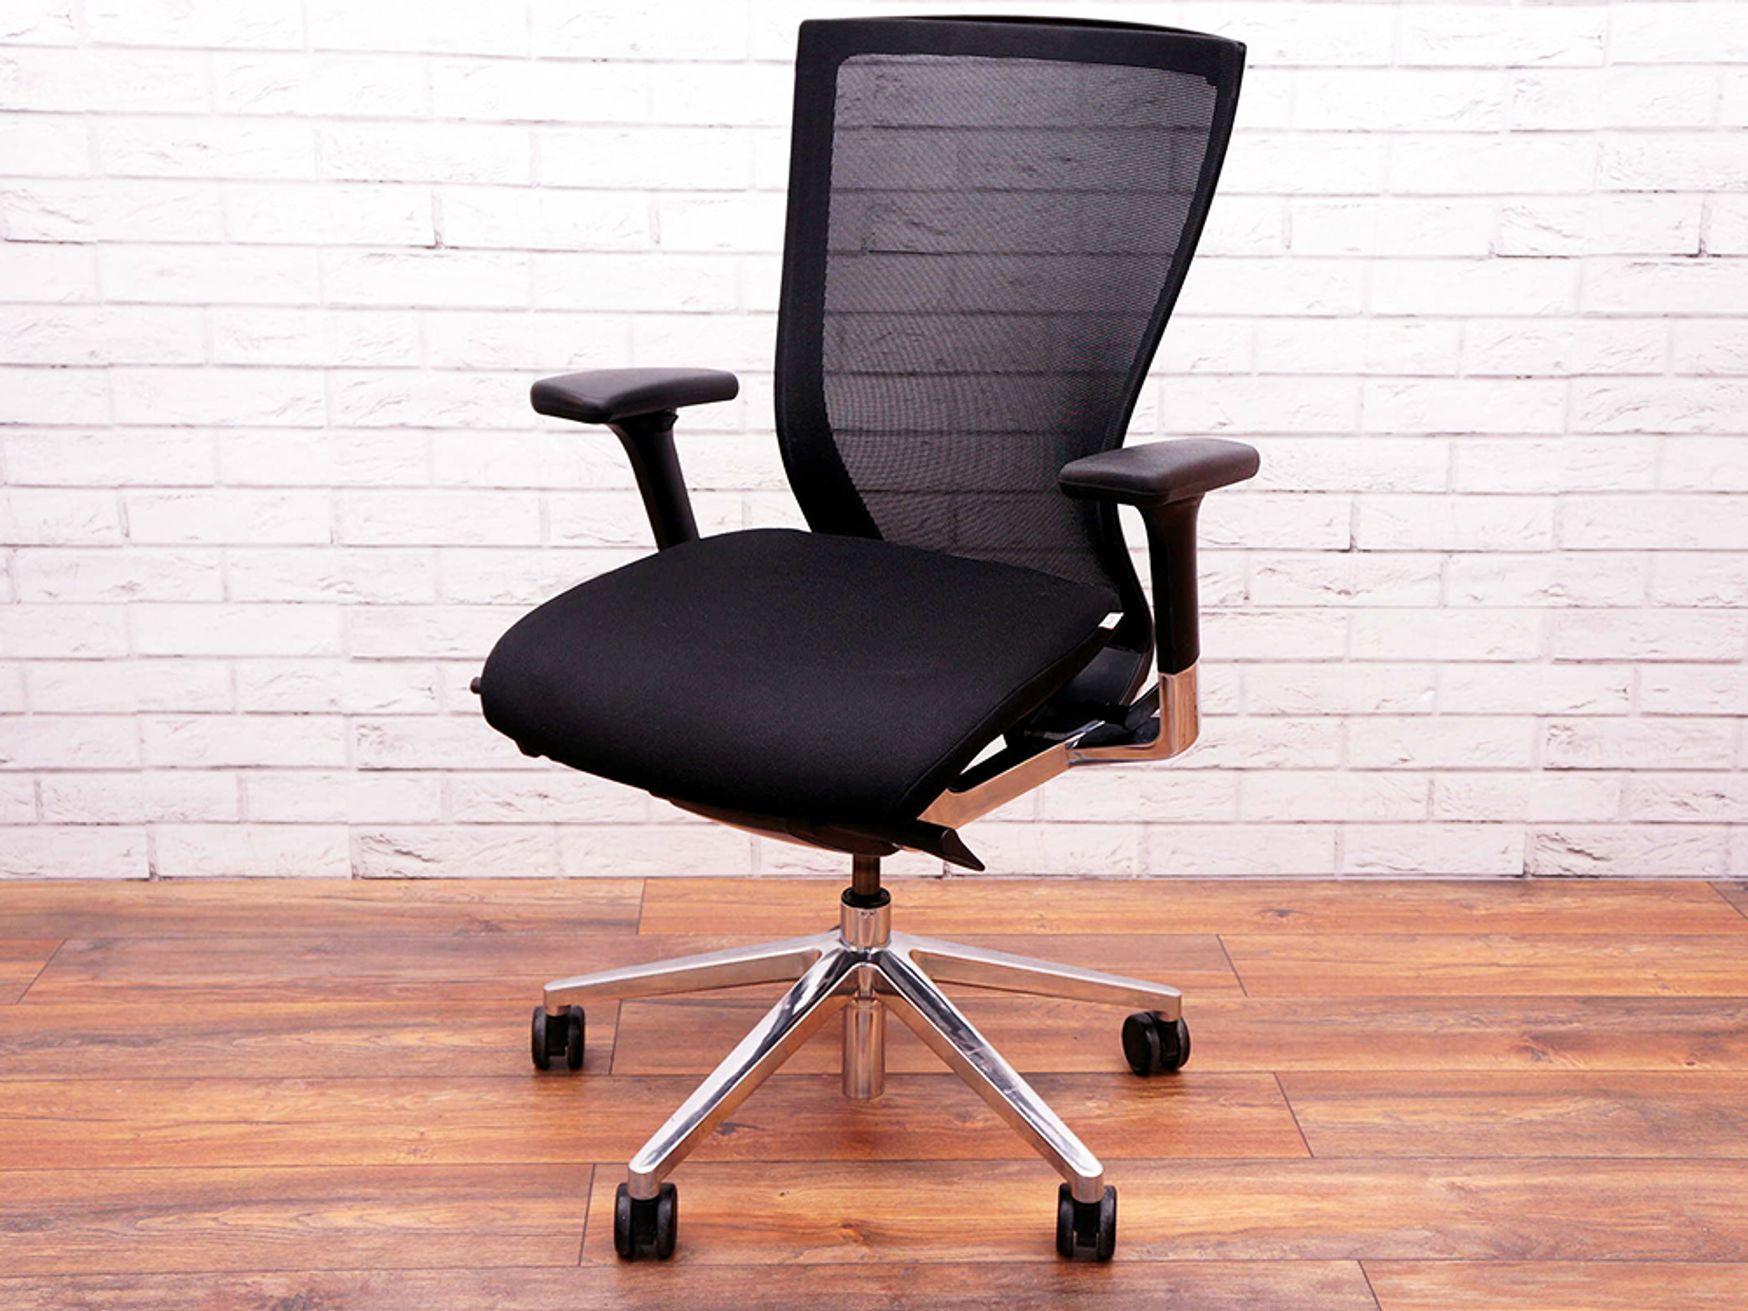 Used Techo Sidiz Mesh-back Office Operator chairs with black seats